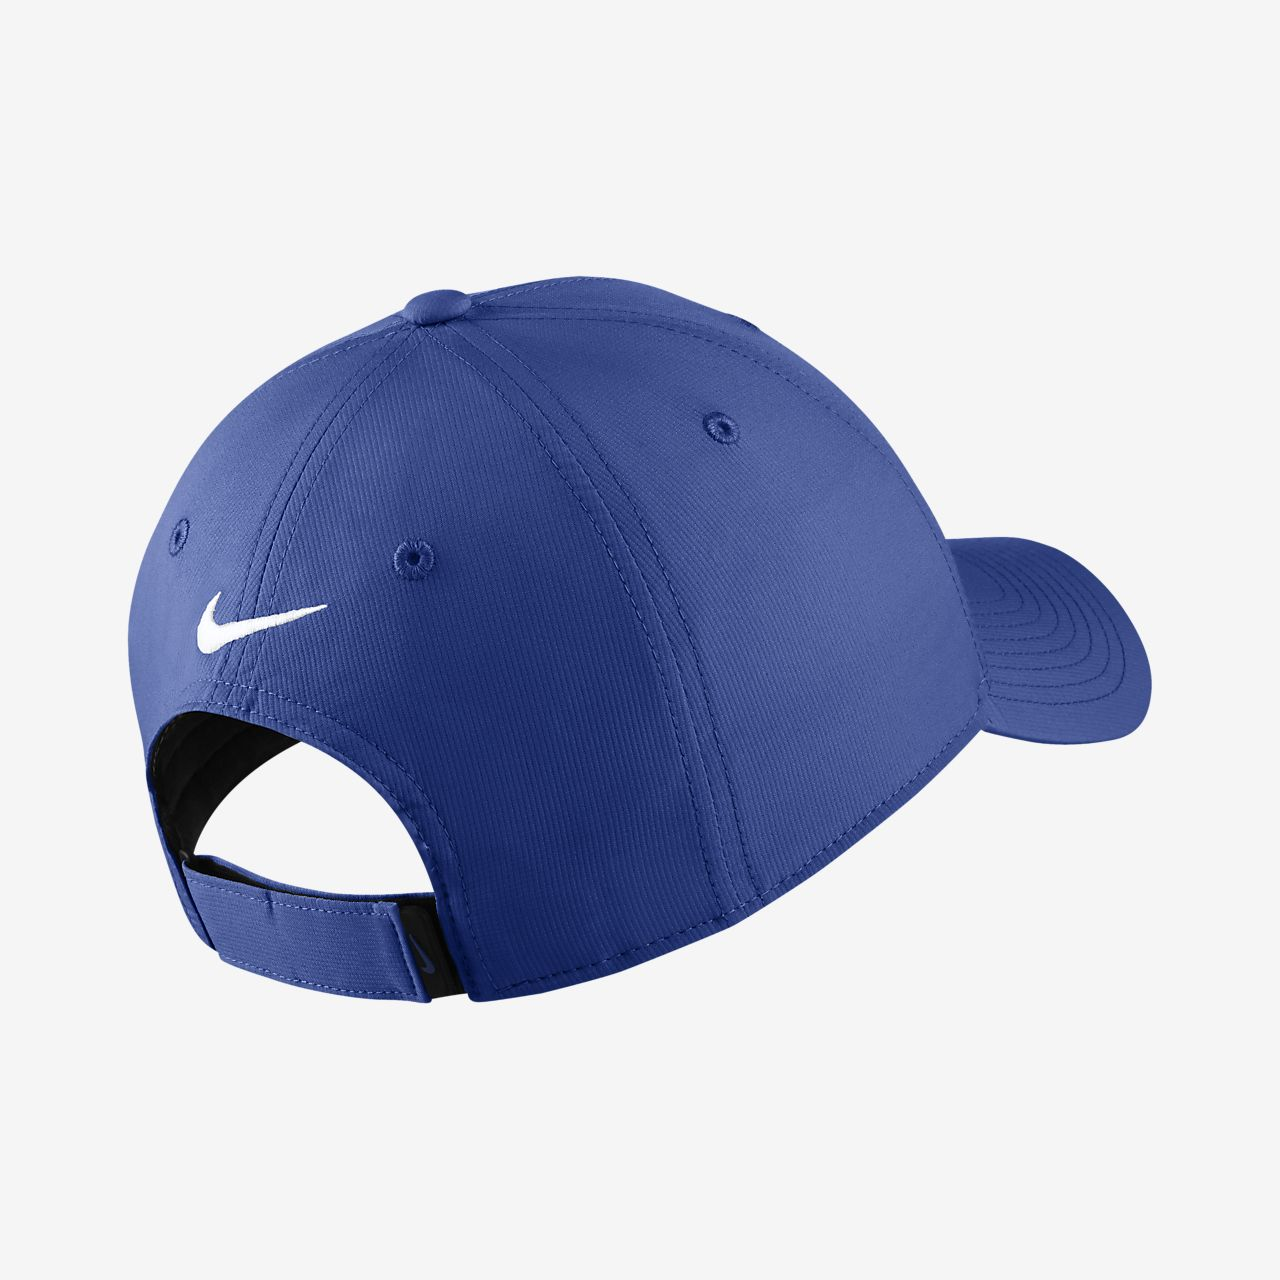 2068f498124 Nike Dri-FIT Legacy91 Golf Hat. Nike.com AE